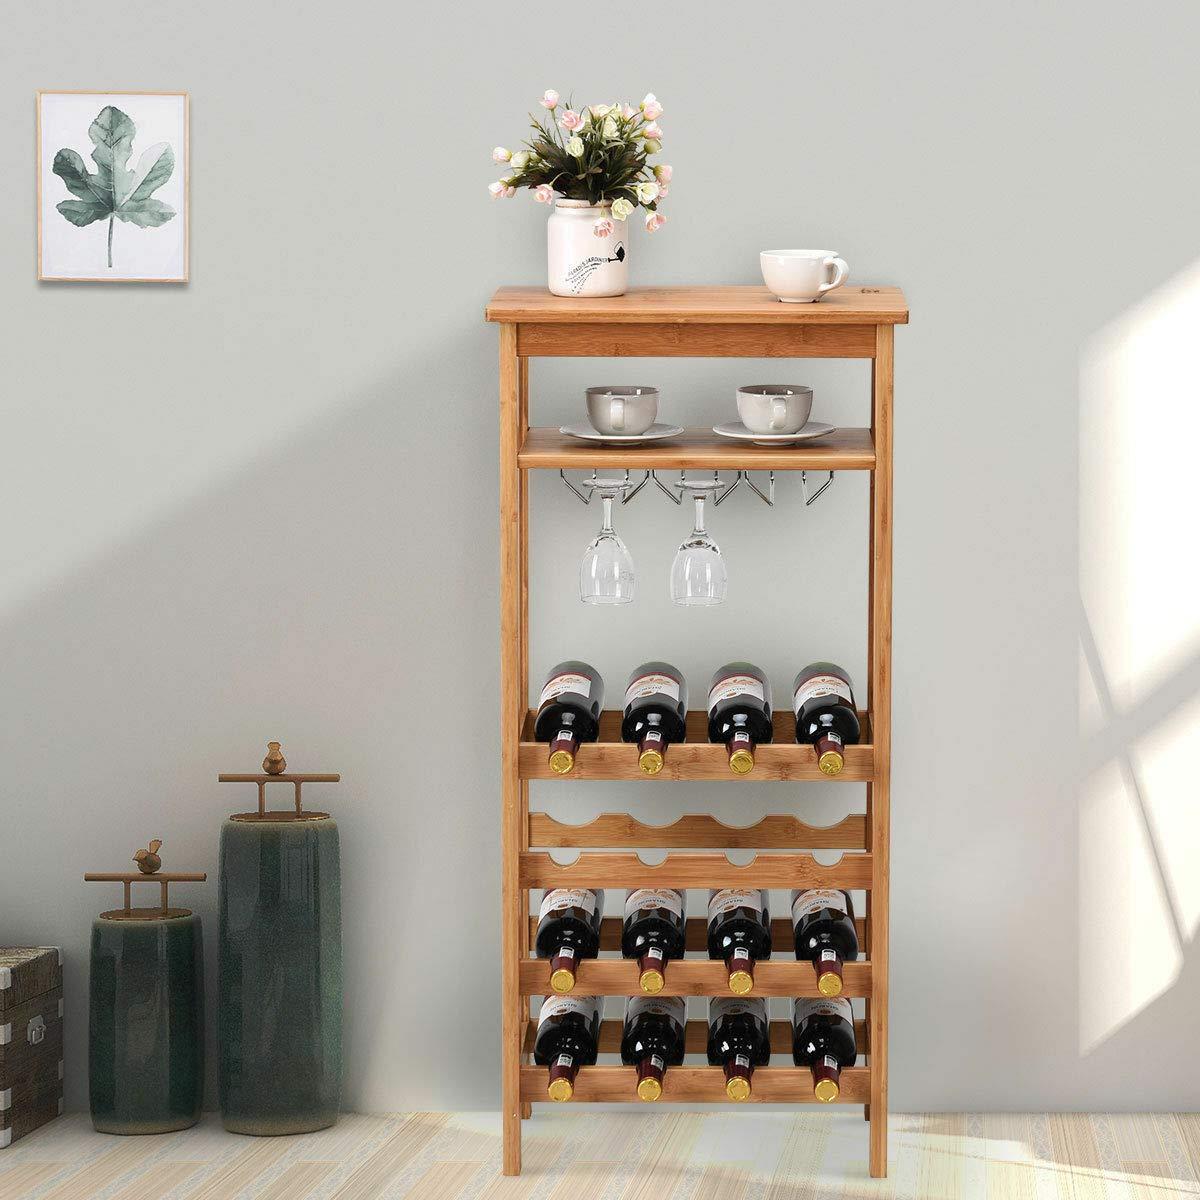 Stark Item 16 Bottles Bamboo Wine Rack Storage Display Shelves W/Glass Hanger & Table Top